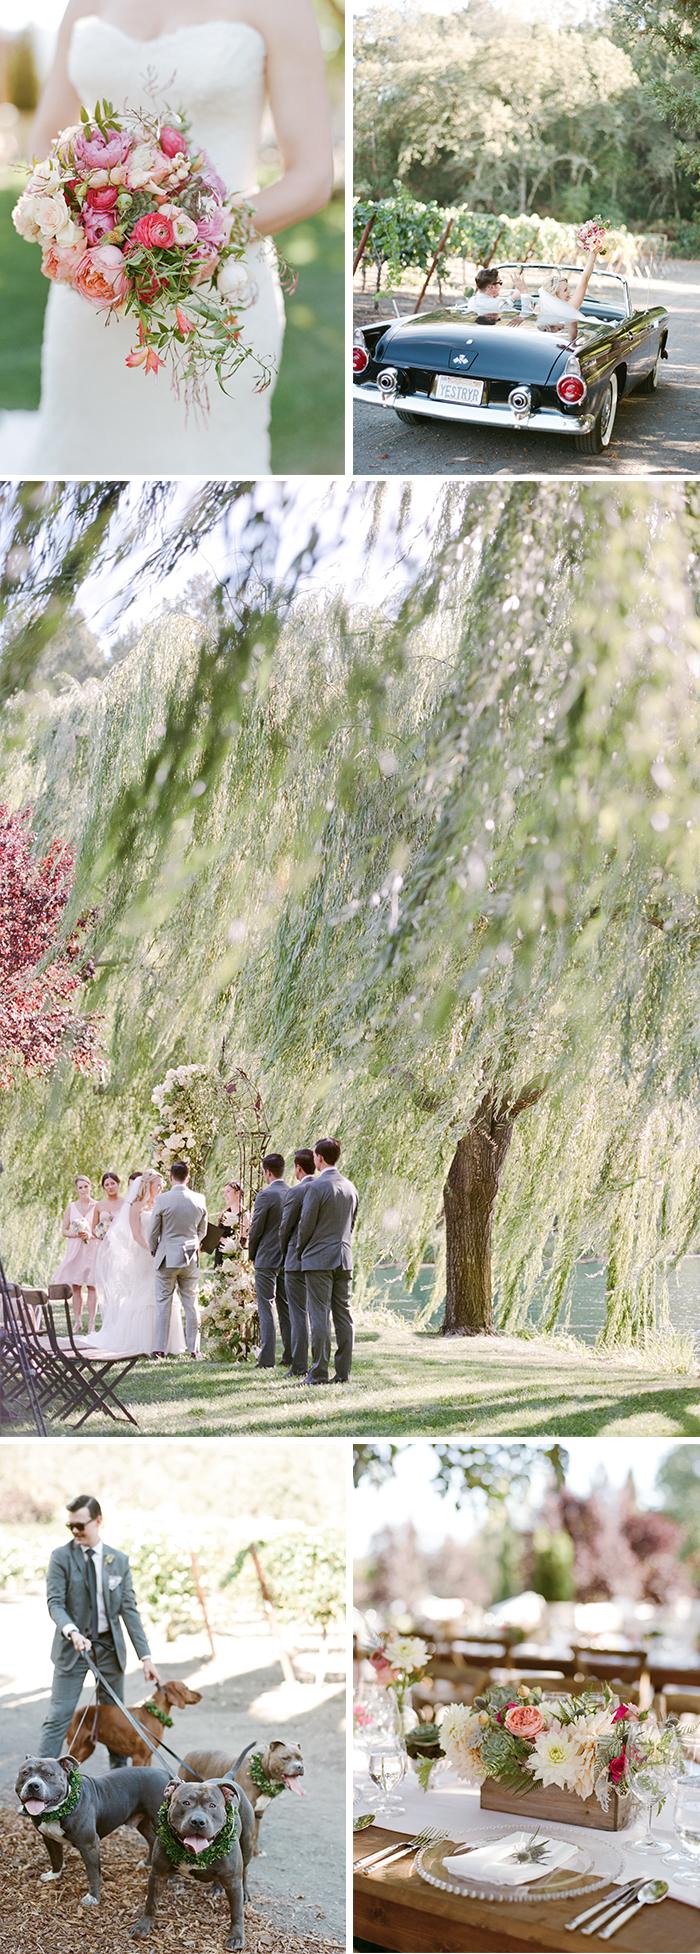 Sylvie-Gil-Black-Swan-Lake-Higgins-Wedding-Photography-Destination.jpg